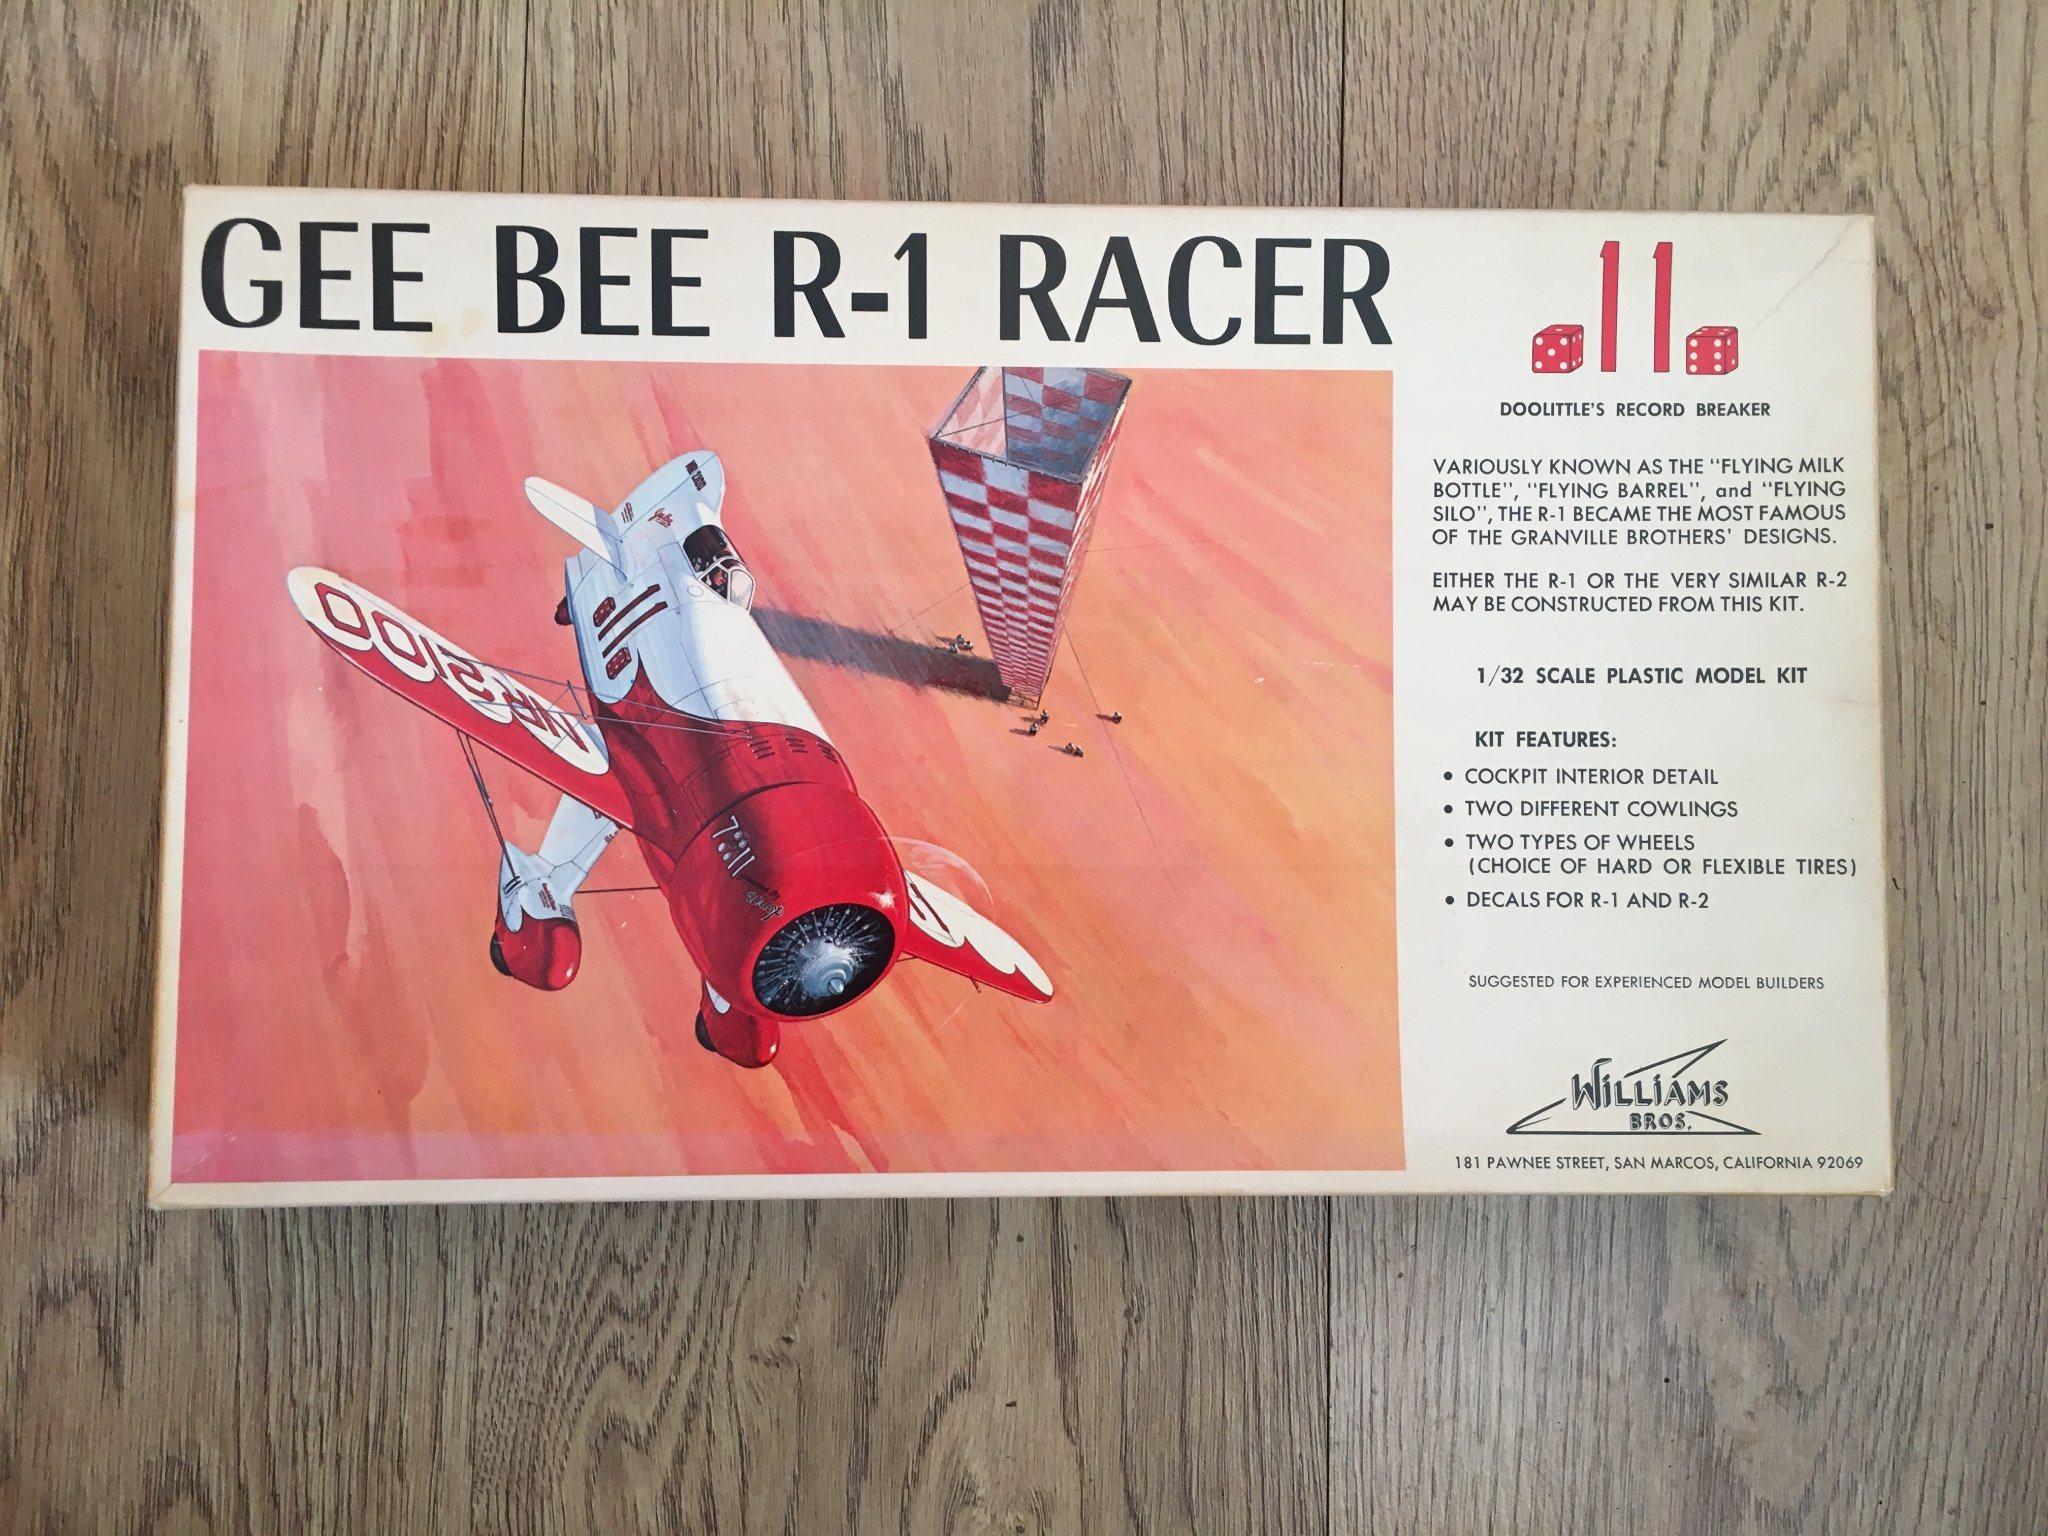 GEE BEE R-1 RACER Skala 1/32 Williams Bros (342076944) ᐈ